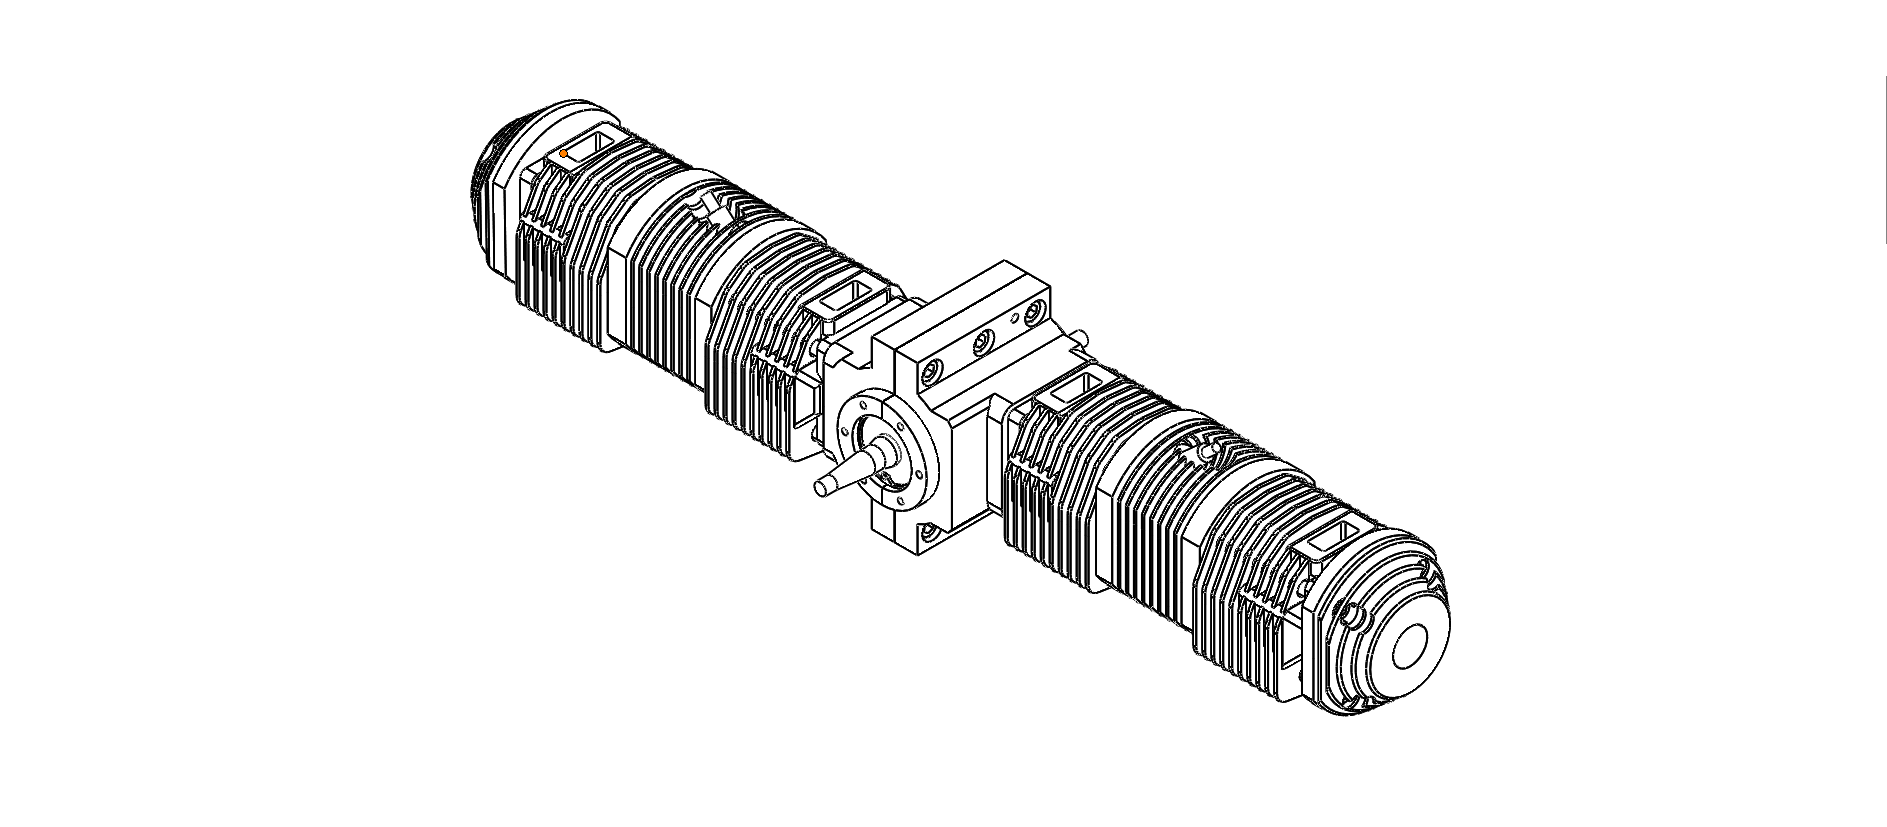 AMP SS-2B 500CC A szkic2.png